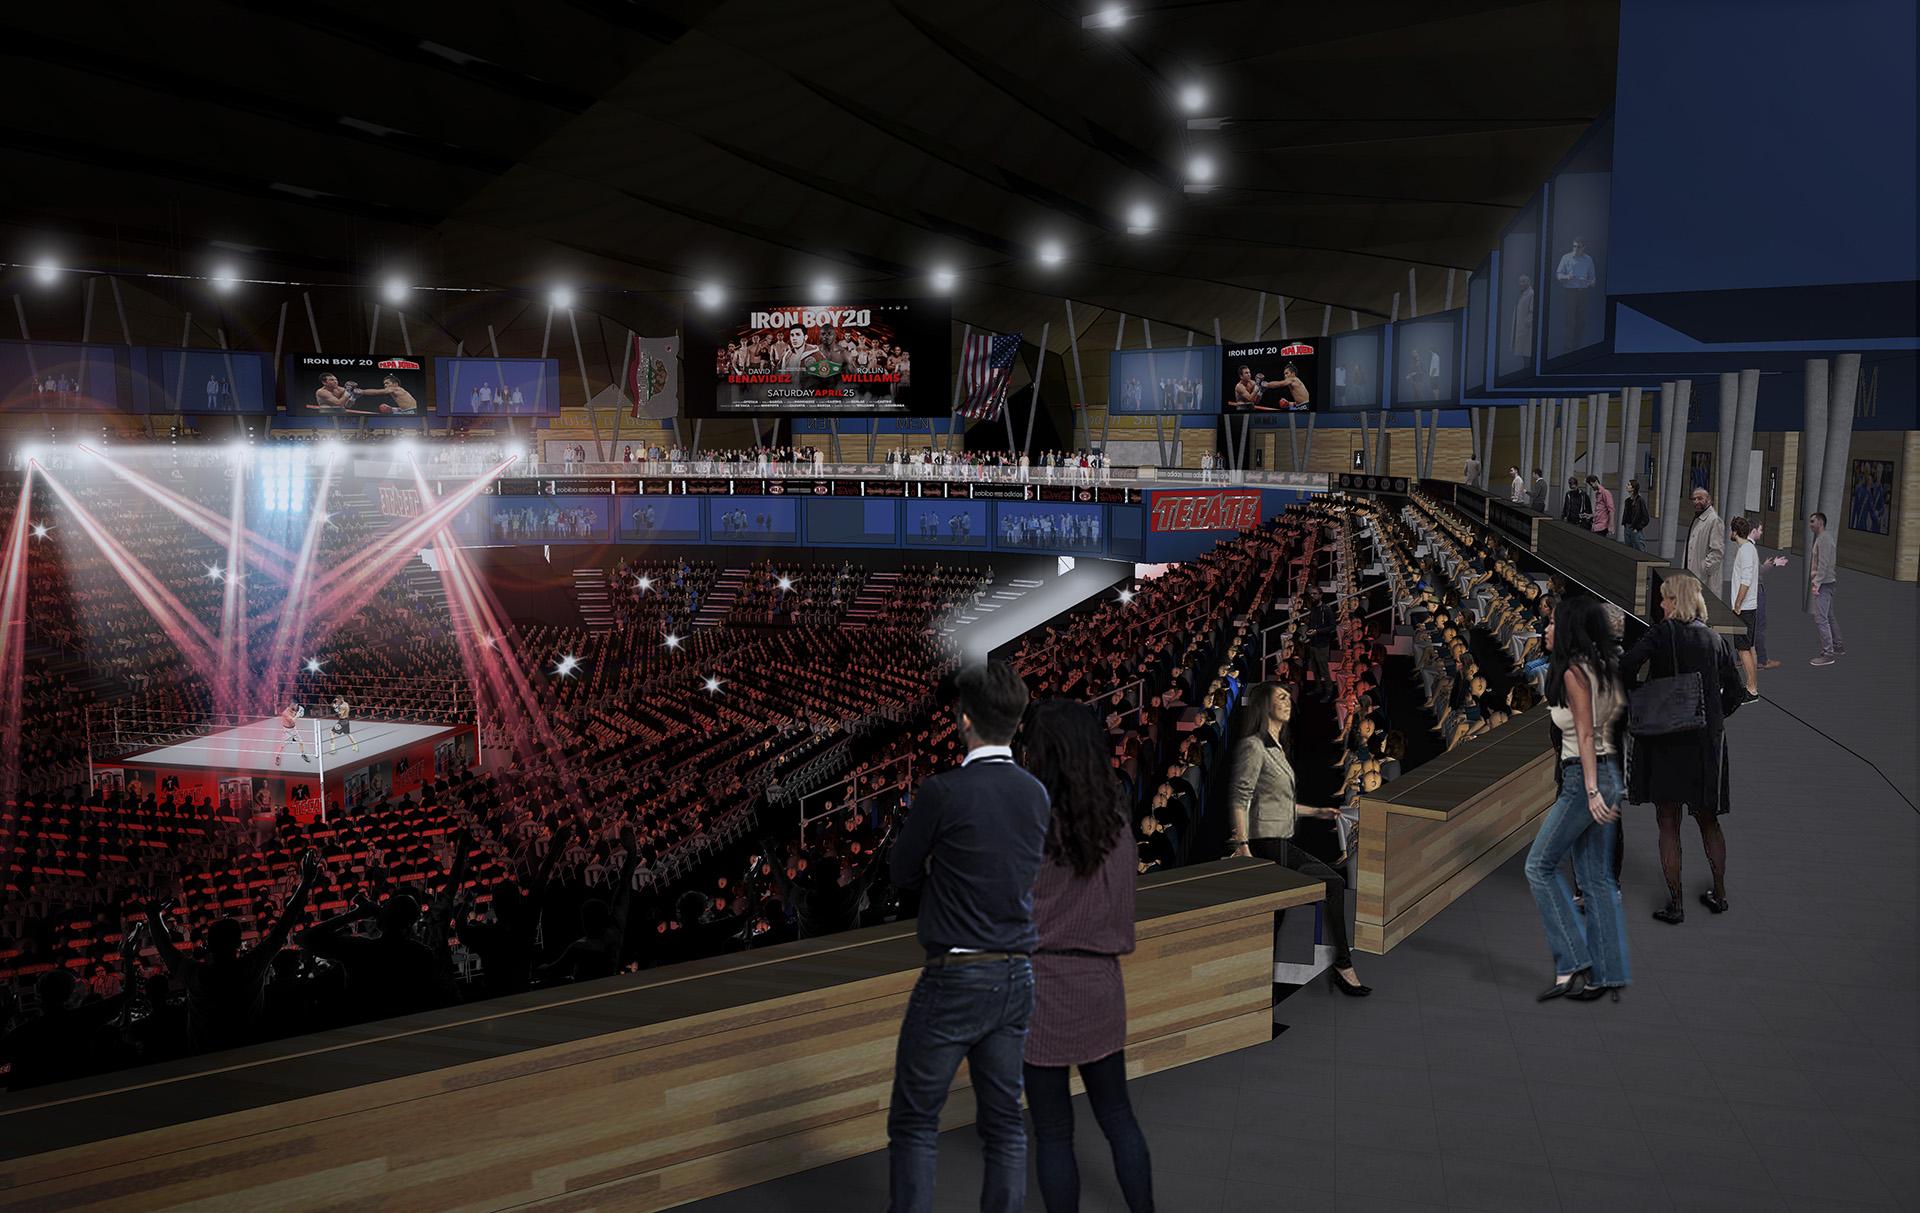 San Diego Arena - Architects Mosher Drew01.jpg